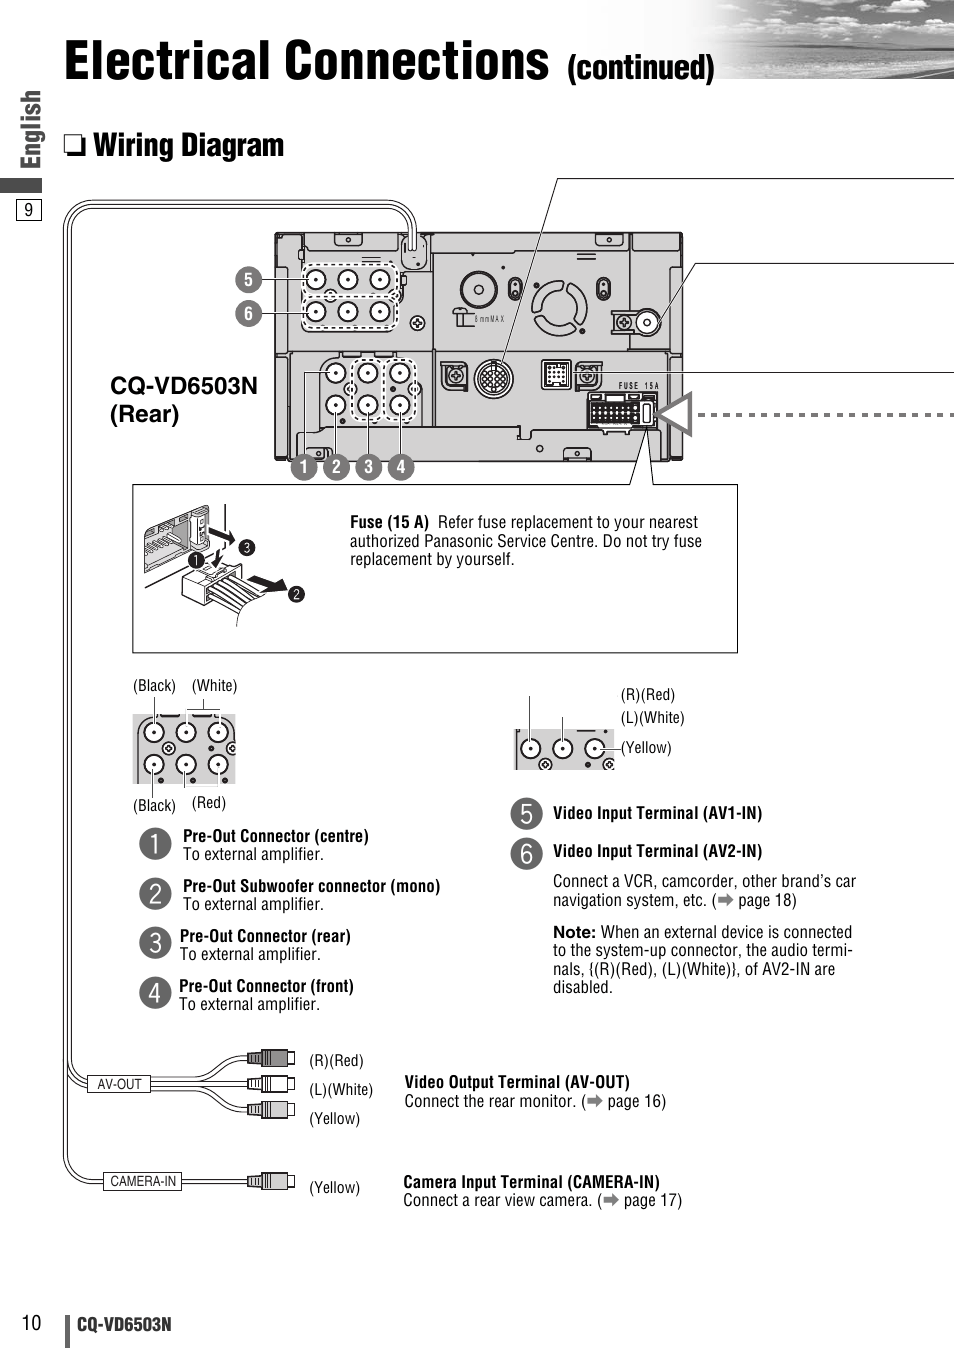 medium resolution of wrg 8370 panasonic cq c1101u wiring diagram panasonic cq rx100u wiring diagram